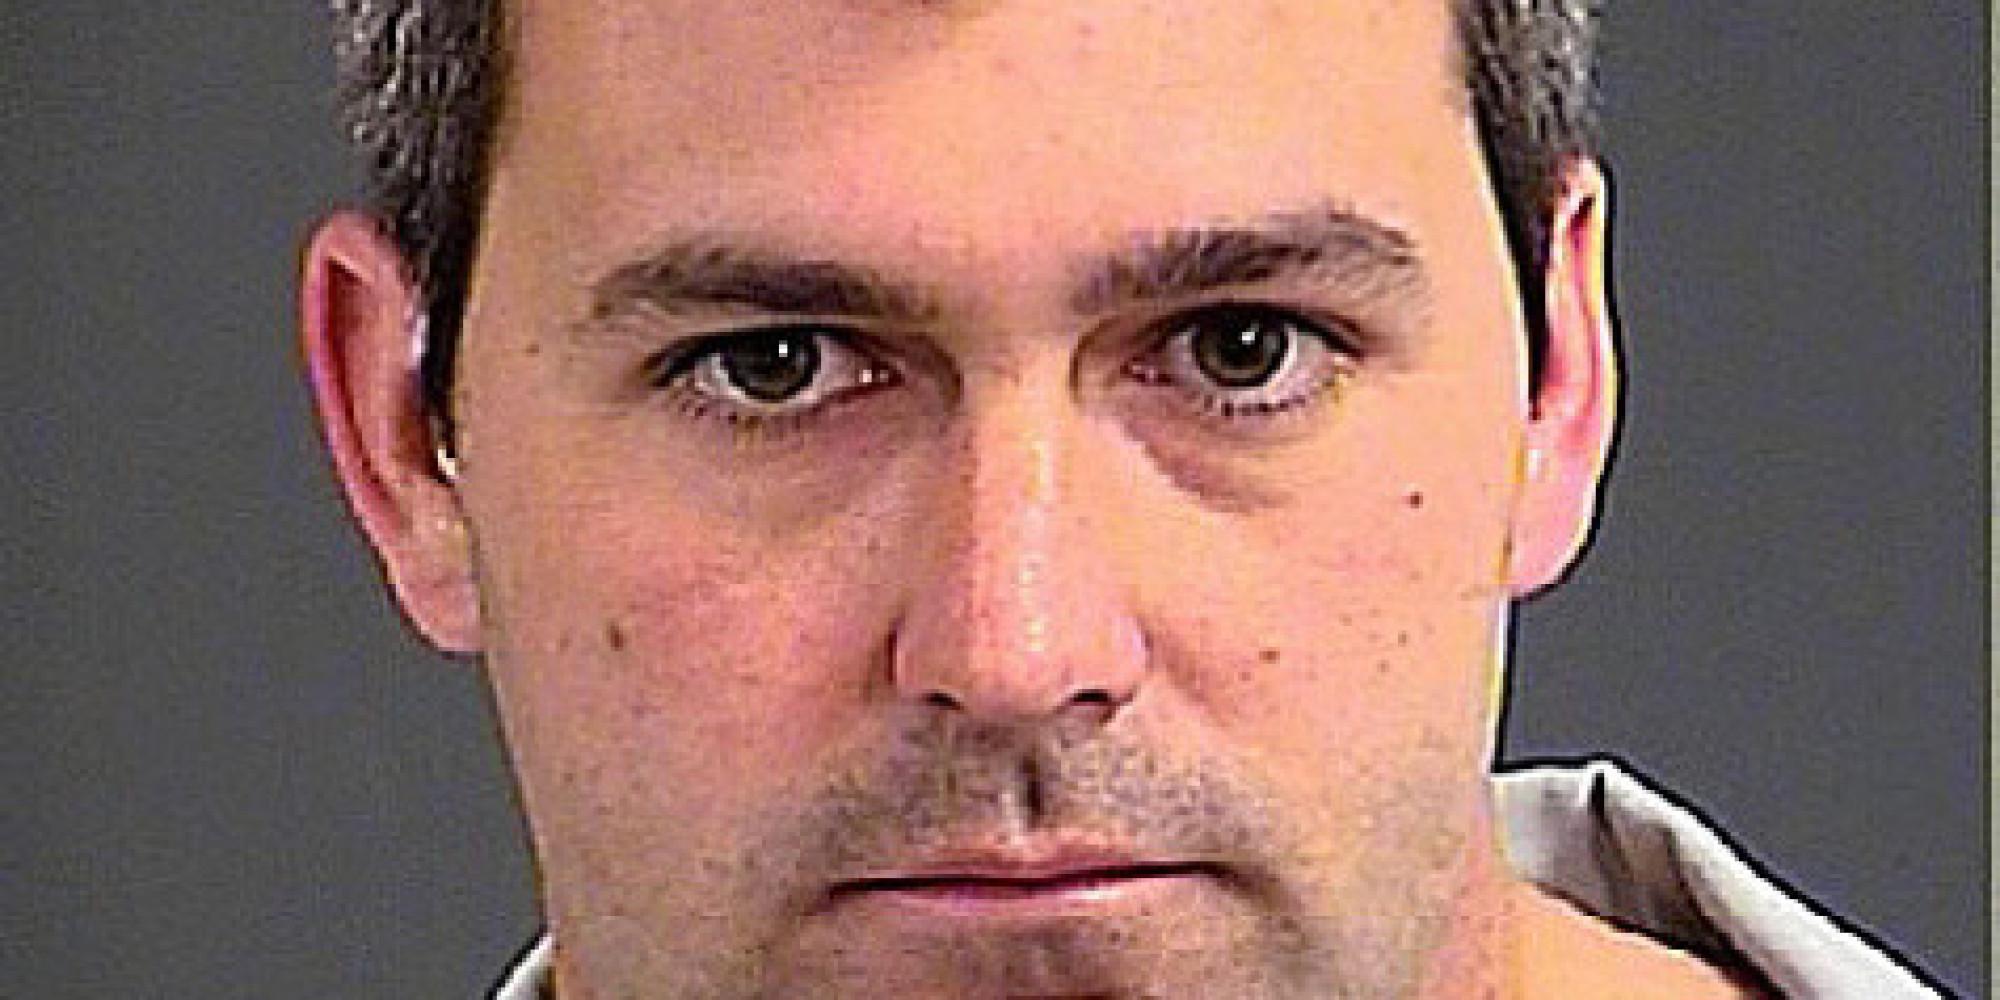 South Carolina Man Vows Suit Over 2013 Excessive Force Complaint